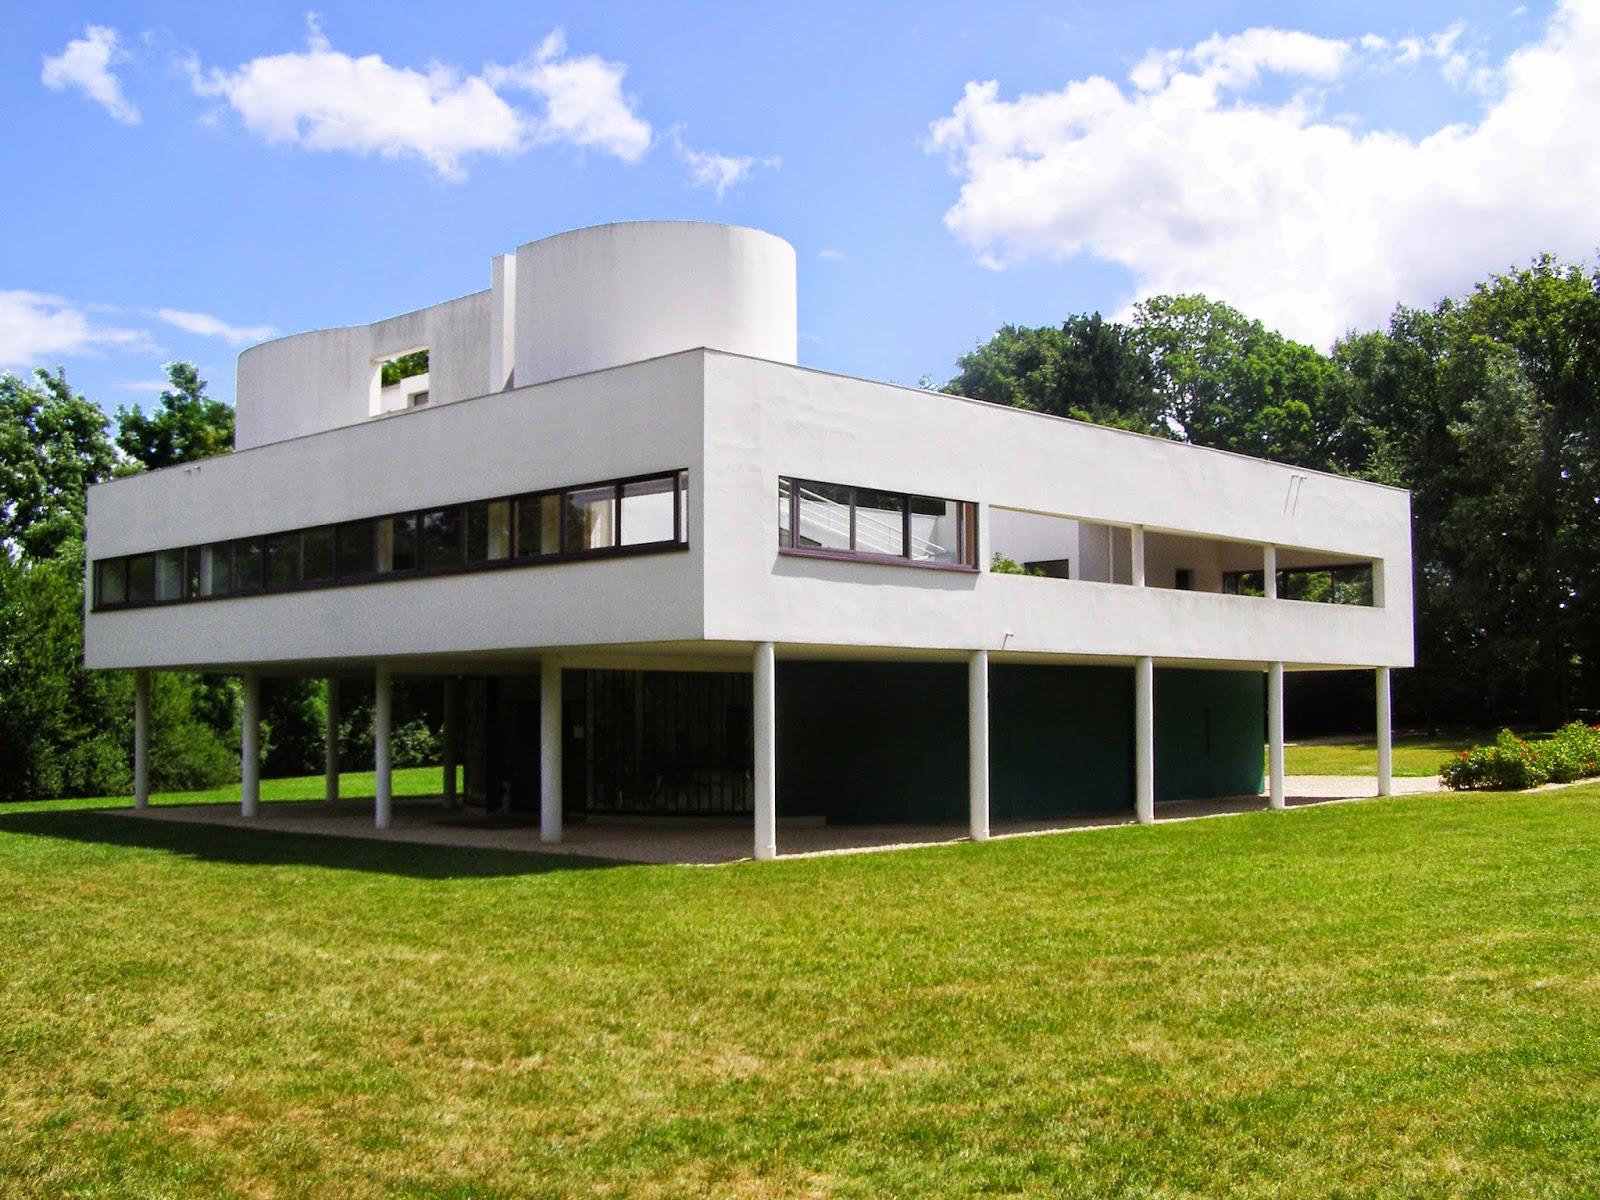 Artchist villa savoie in poissy le corbusier - Arquitecto le corbusier ...